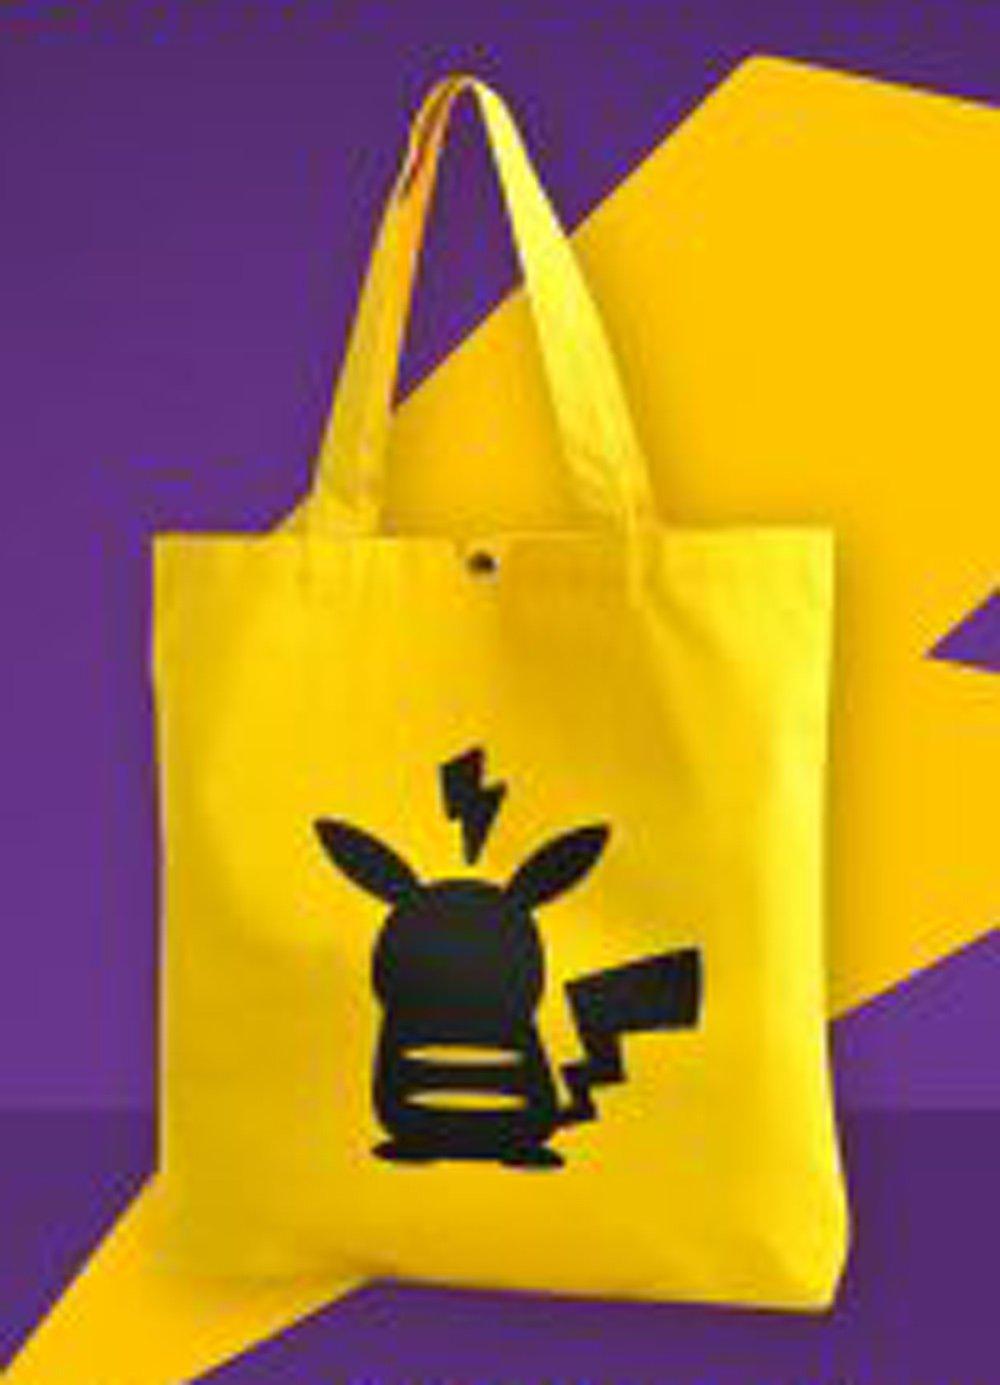 "Pokemon Pikachu Yellow Tote Bag 14.5"" x 15.5"" / 370 mm x 390 mm"